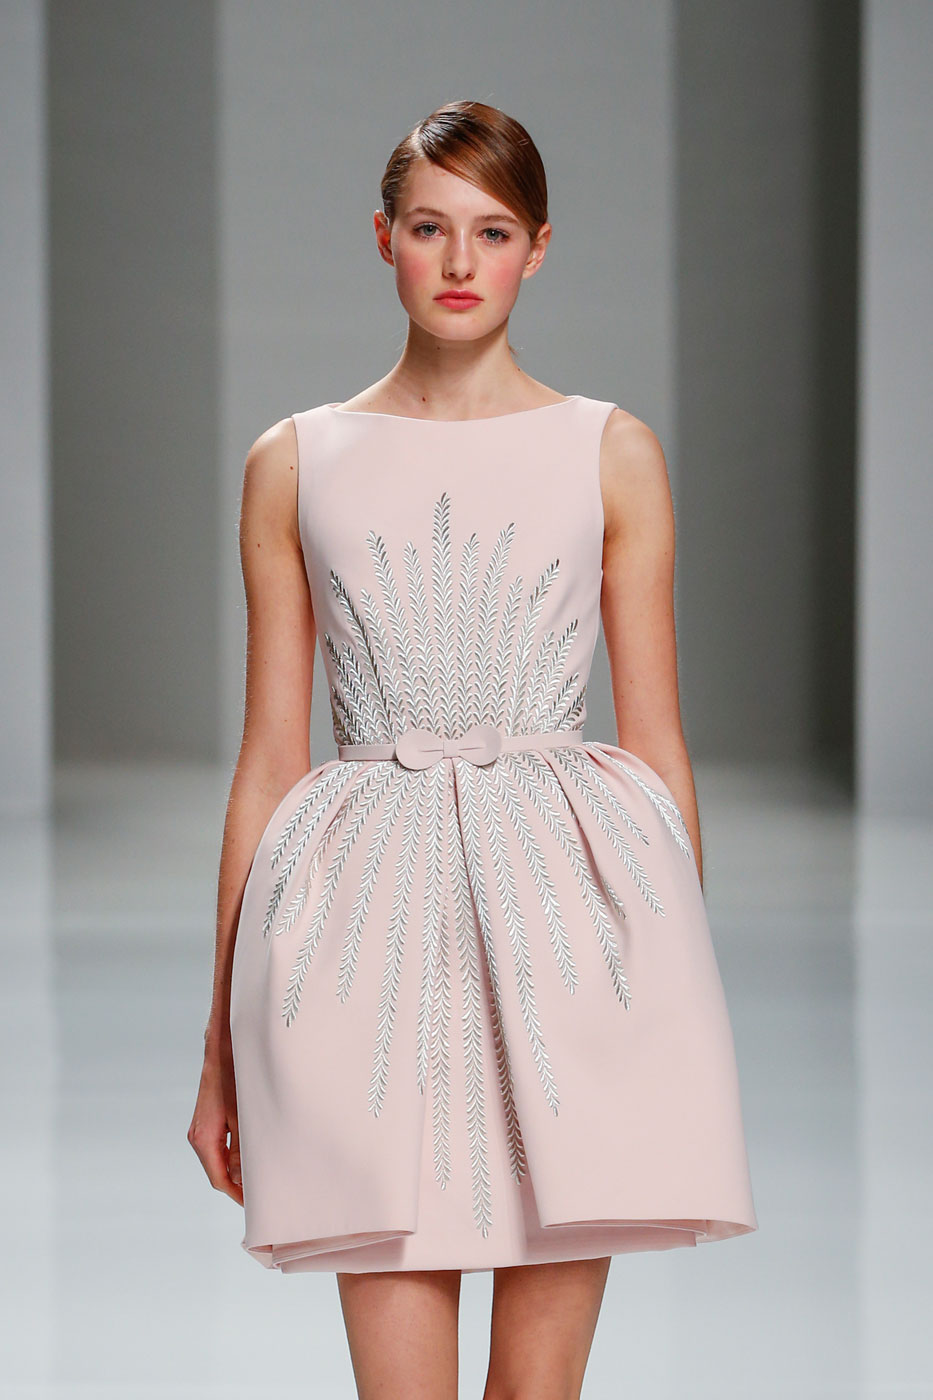 Georges-Hobeika-fashion-runway-show-haute-couture-paris-spring-2015-the-impression-02